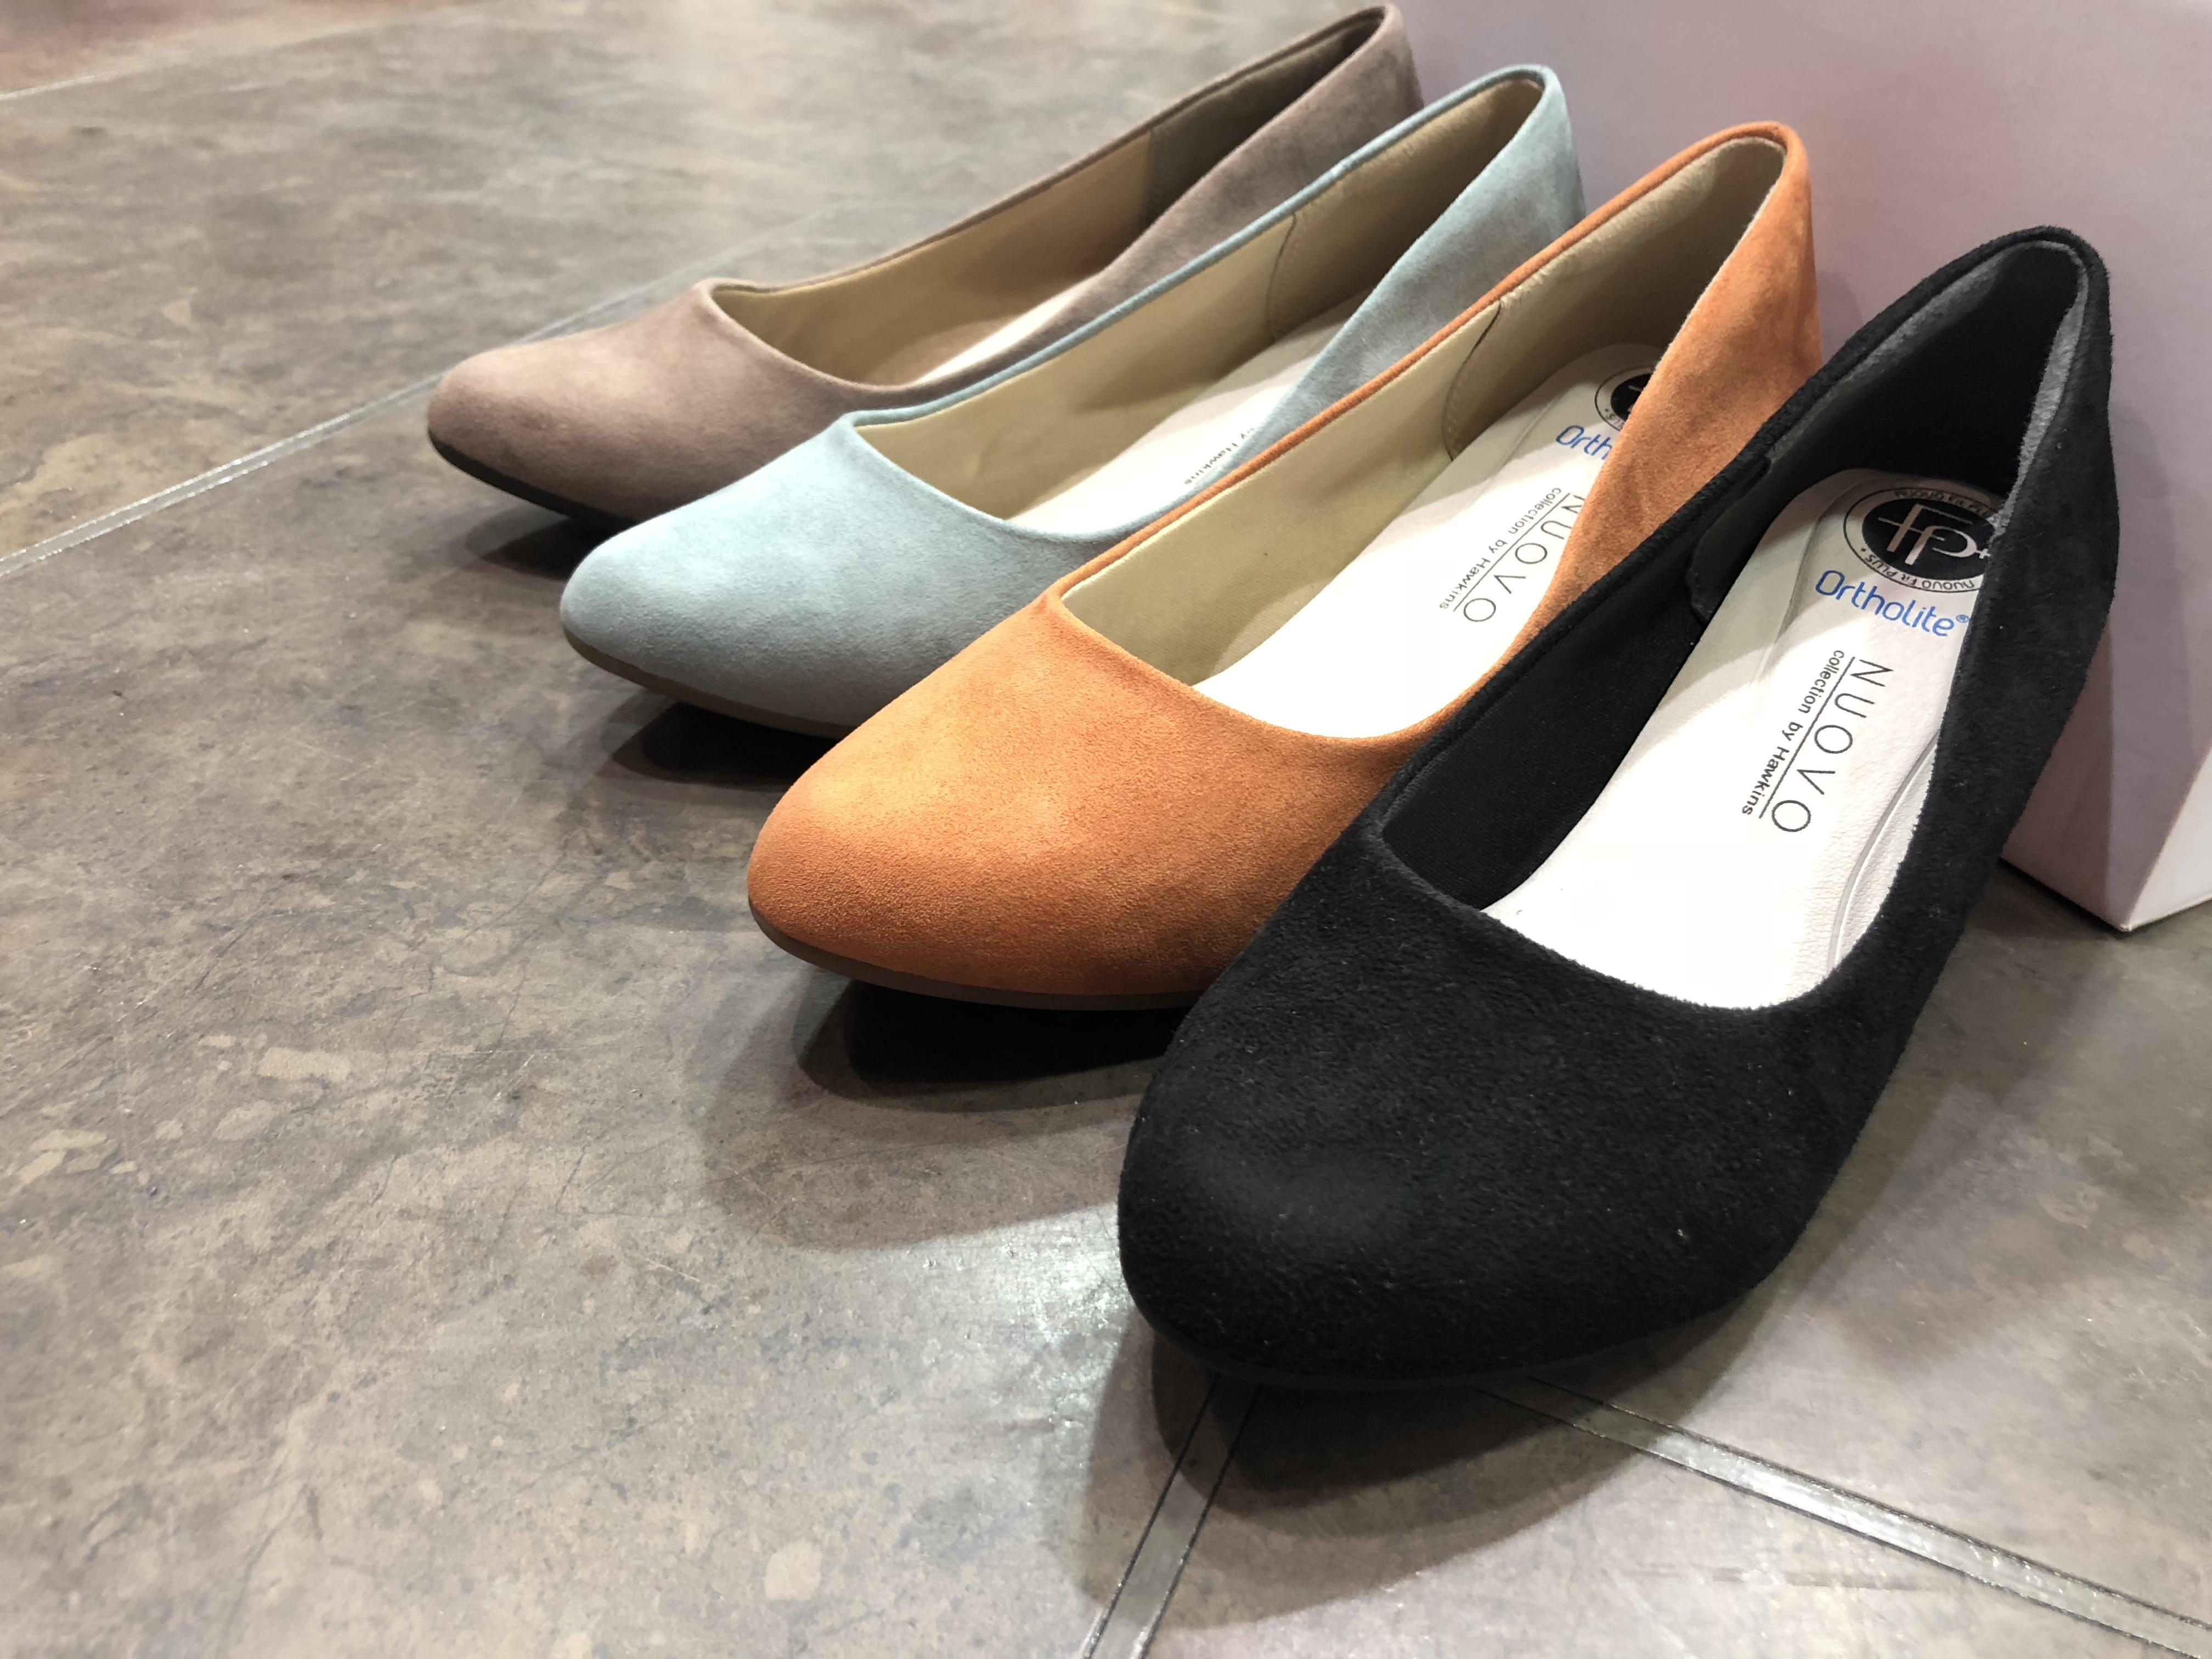 Detalles de Diadora Heritage Exodus NYL, Sneakers Uomo, scarpa sportiva, Vintage anni 90